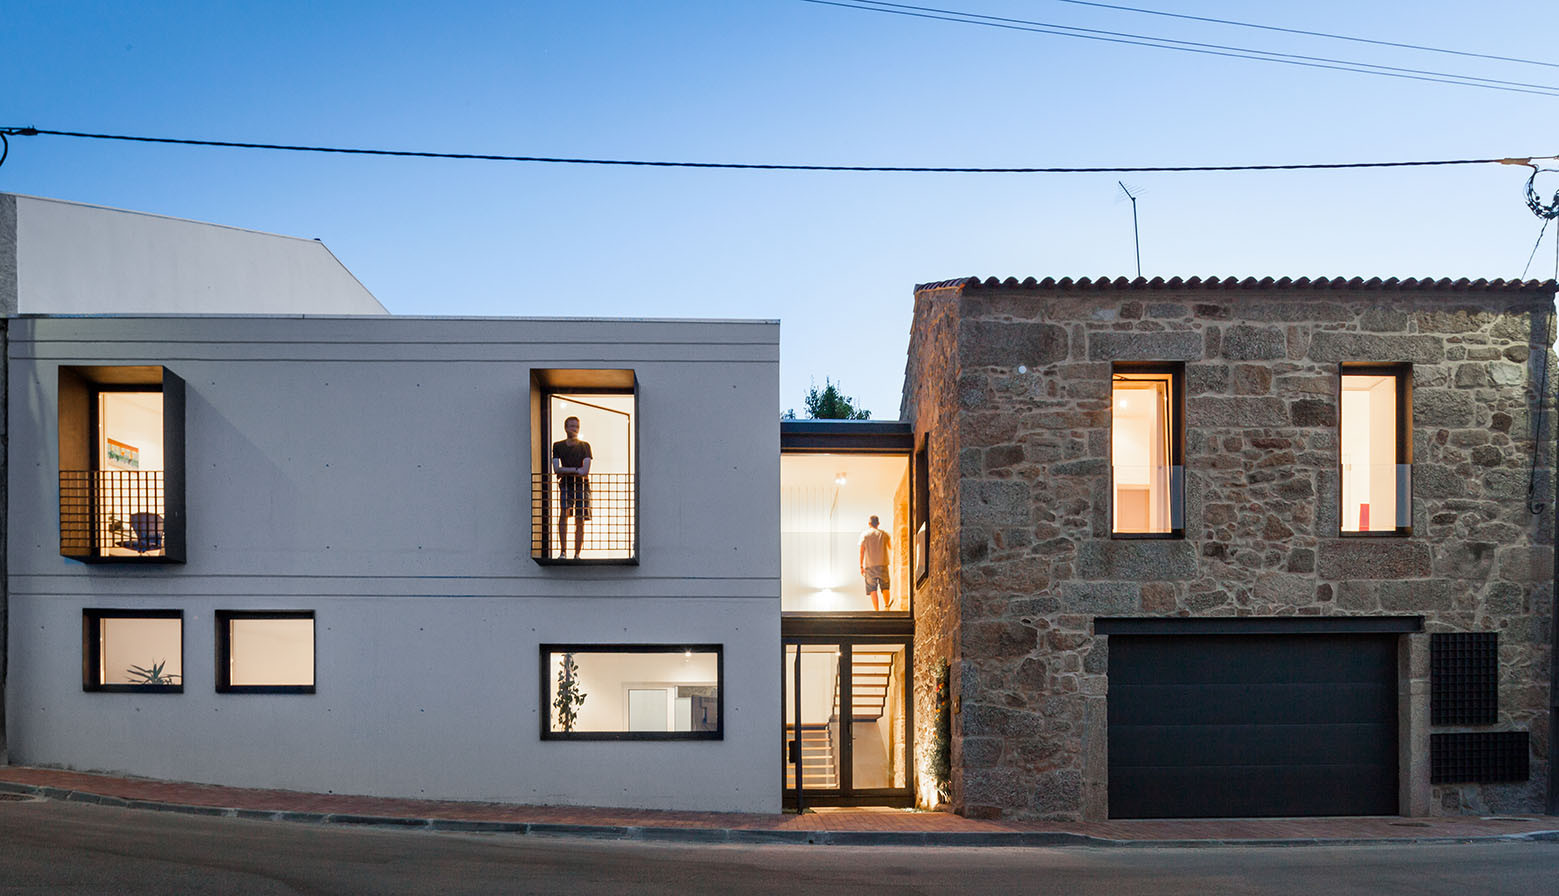 JA House / Maria Ines Costa + Filipe Pina